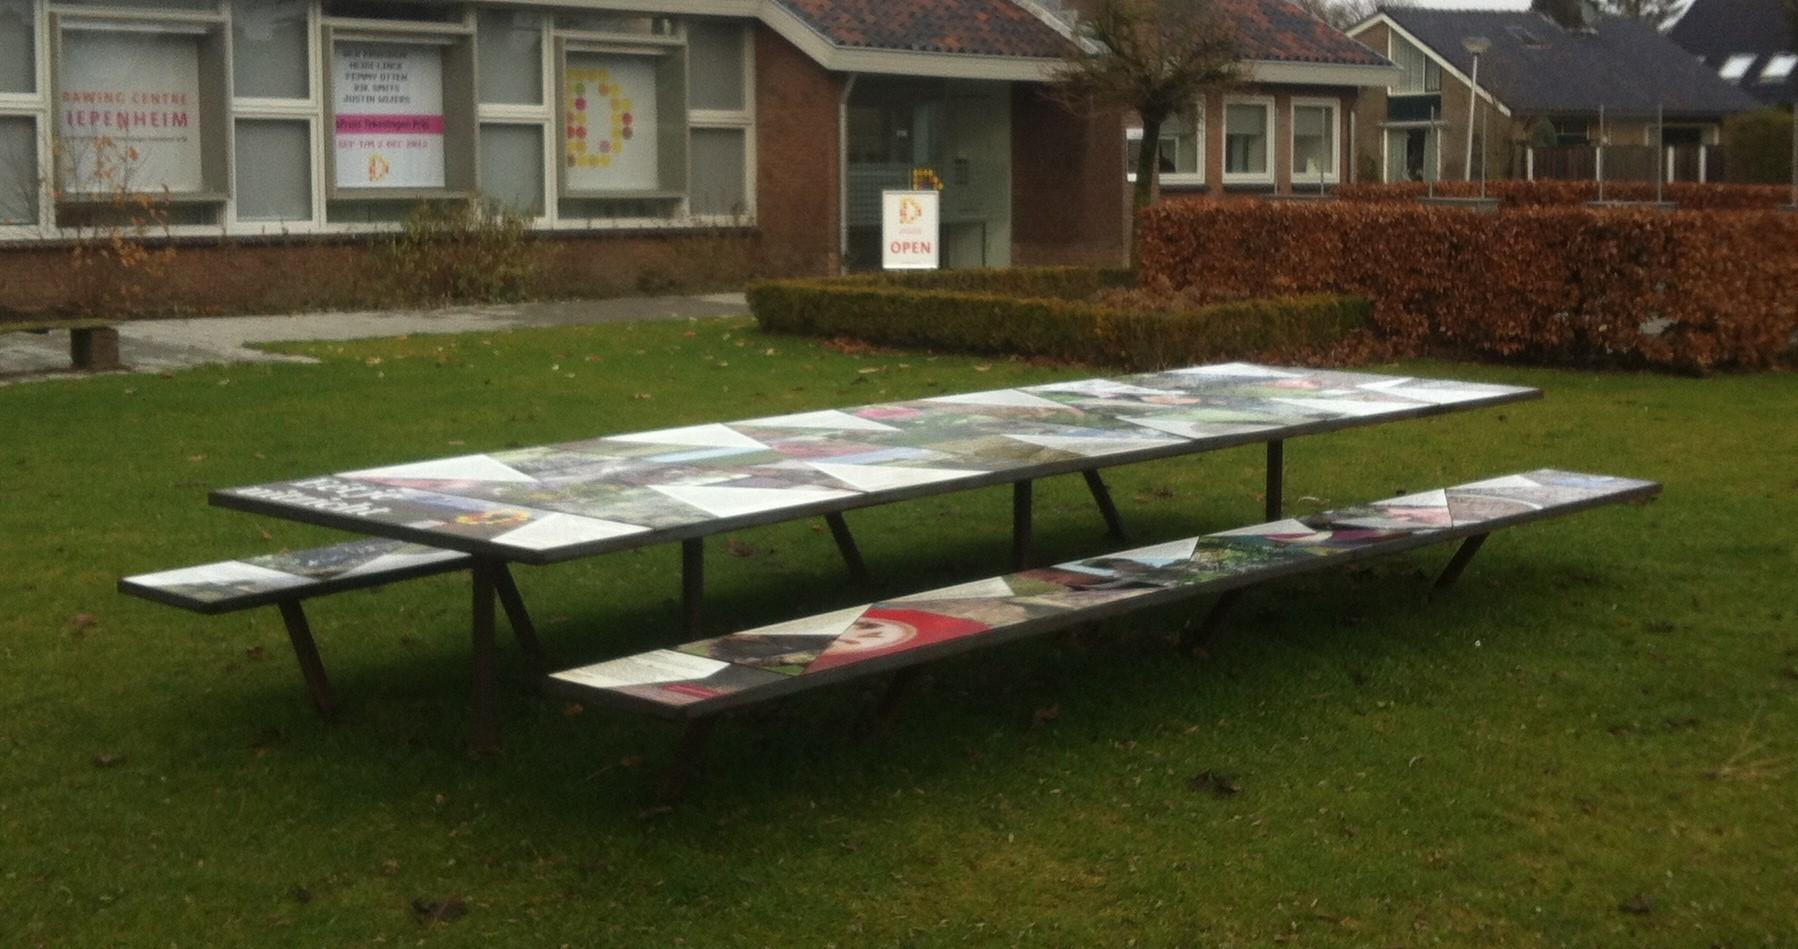 Kunst tafel 2